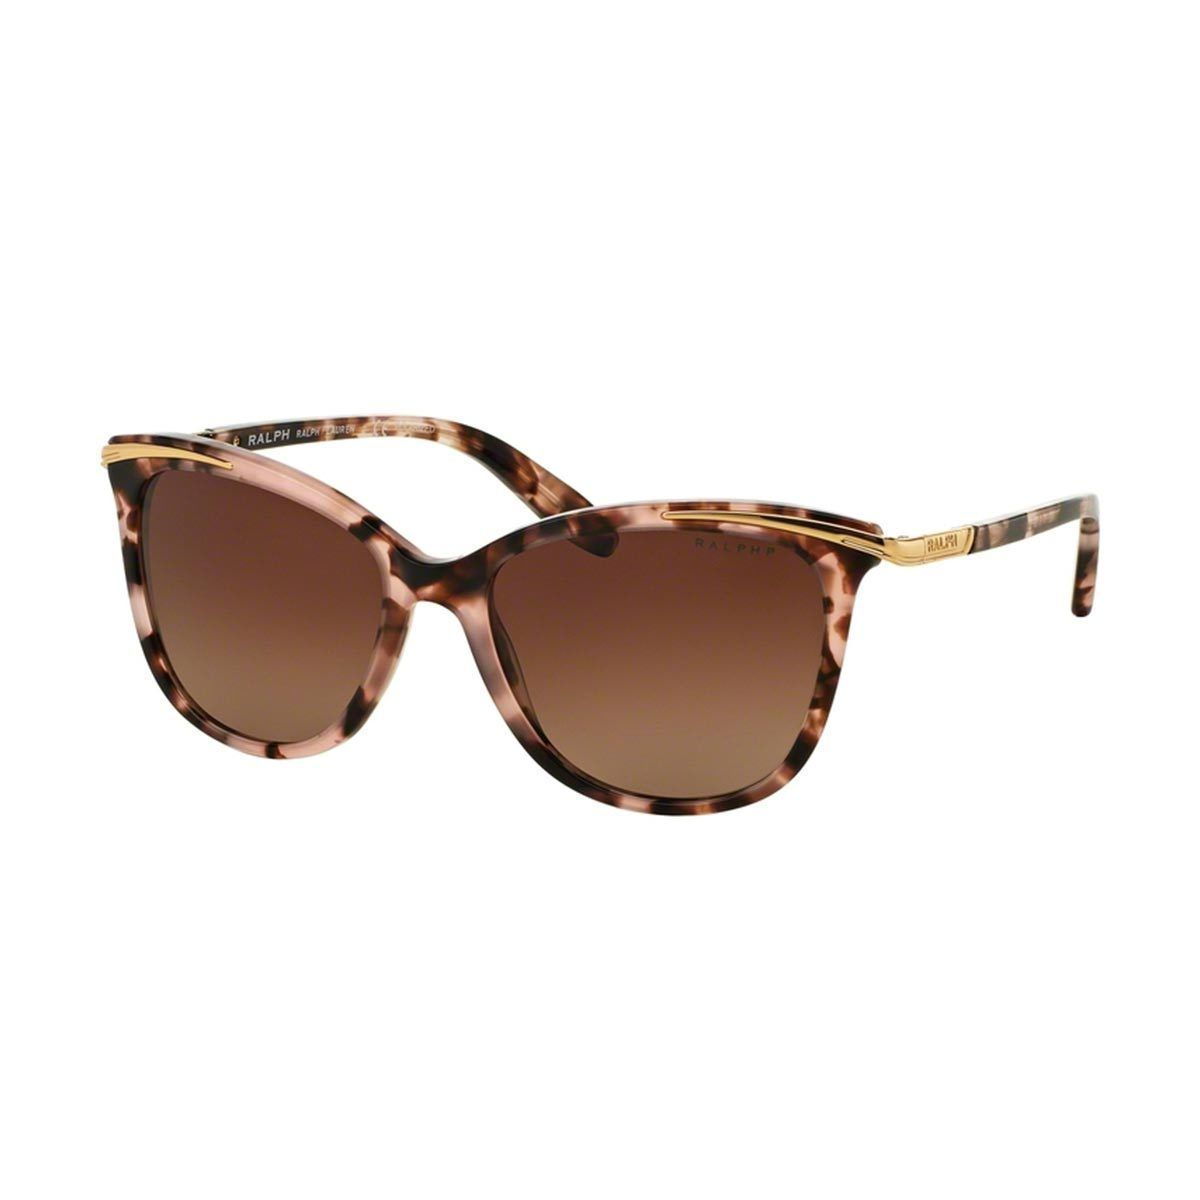 a2da08994b1 Ralph Lauren RA 5203 1090T5 Women s Black Tan Brown Polarized 54-16-135 mm  Sunglasses by Ralph Lauren (Pink Tortoise (Green) Brown Gradient Polarized)